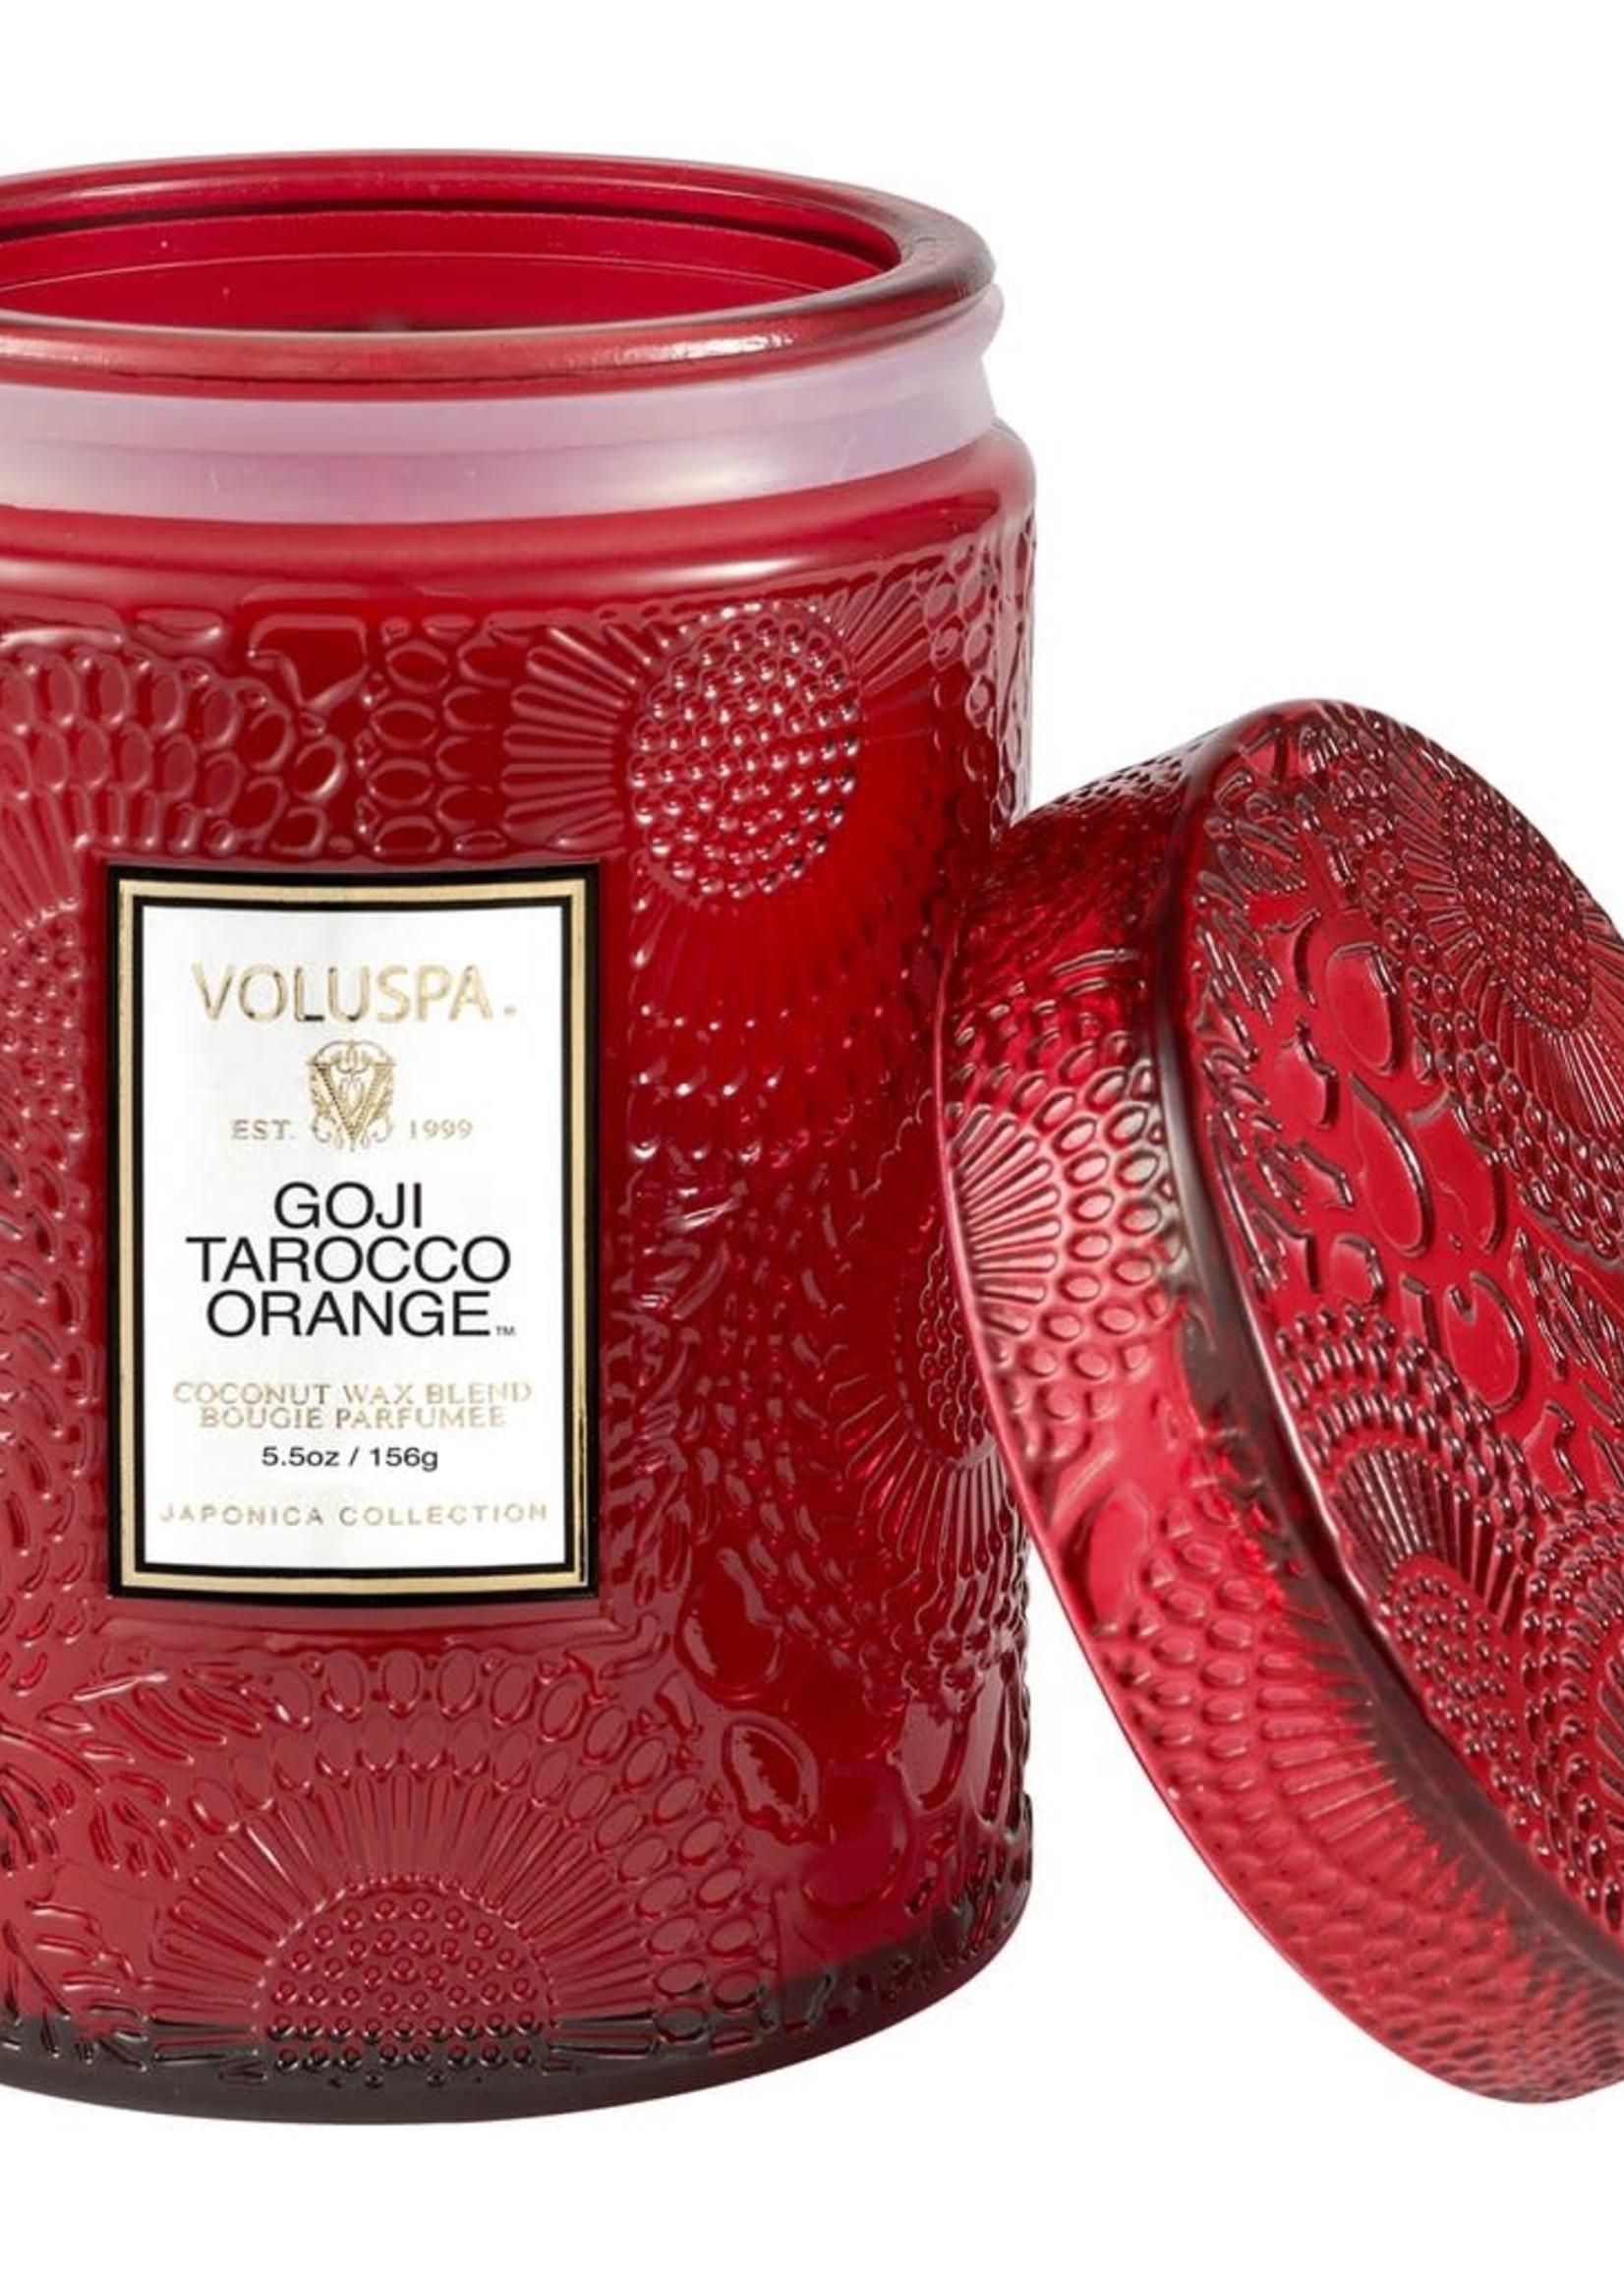 Goji & Tarocco Orange 5.5 Oz Mini Embossed Glass Jar Candle W/ Lid